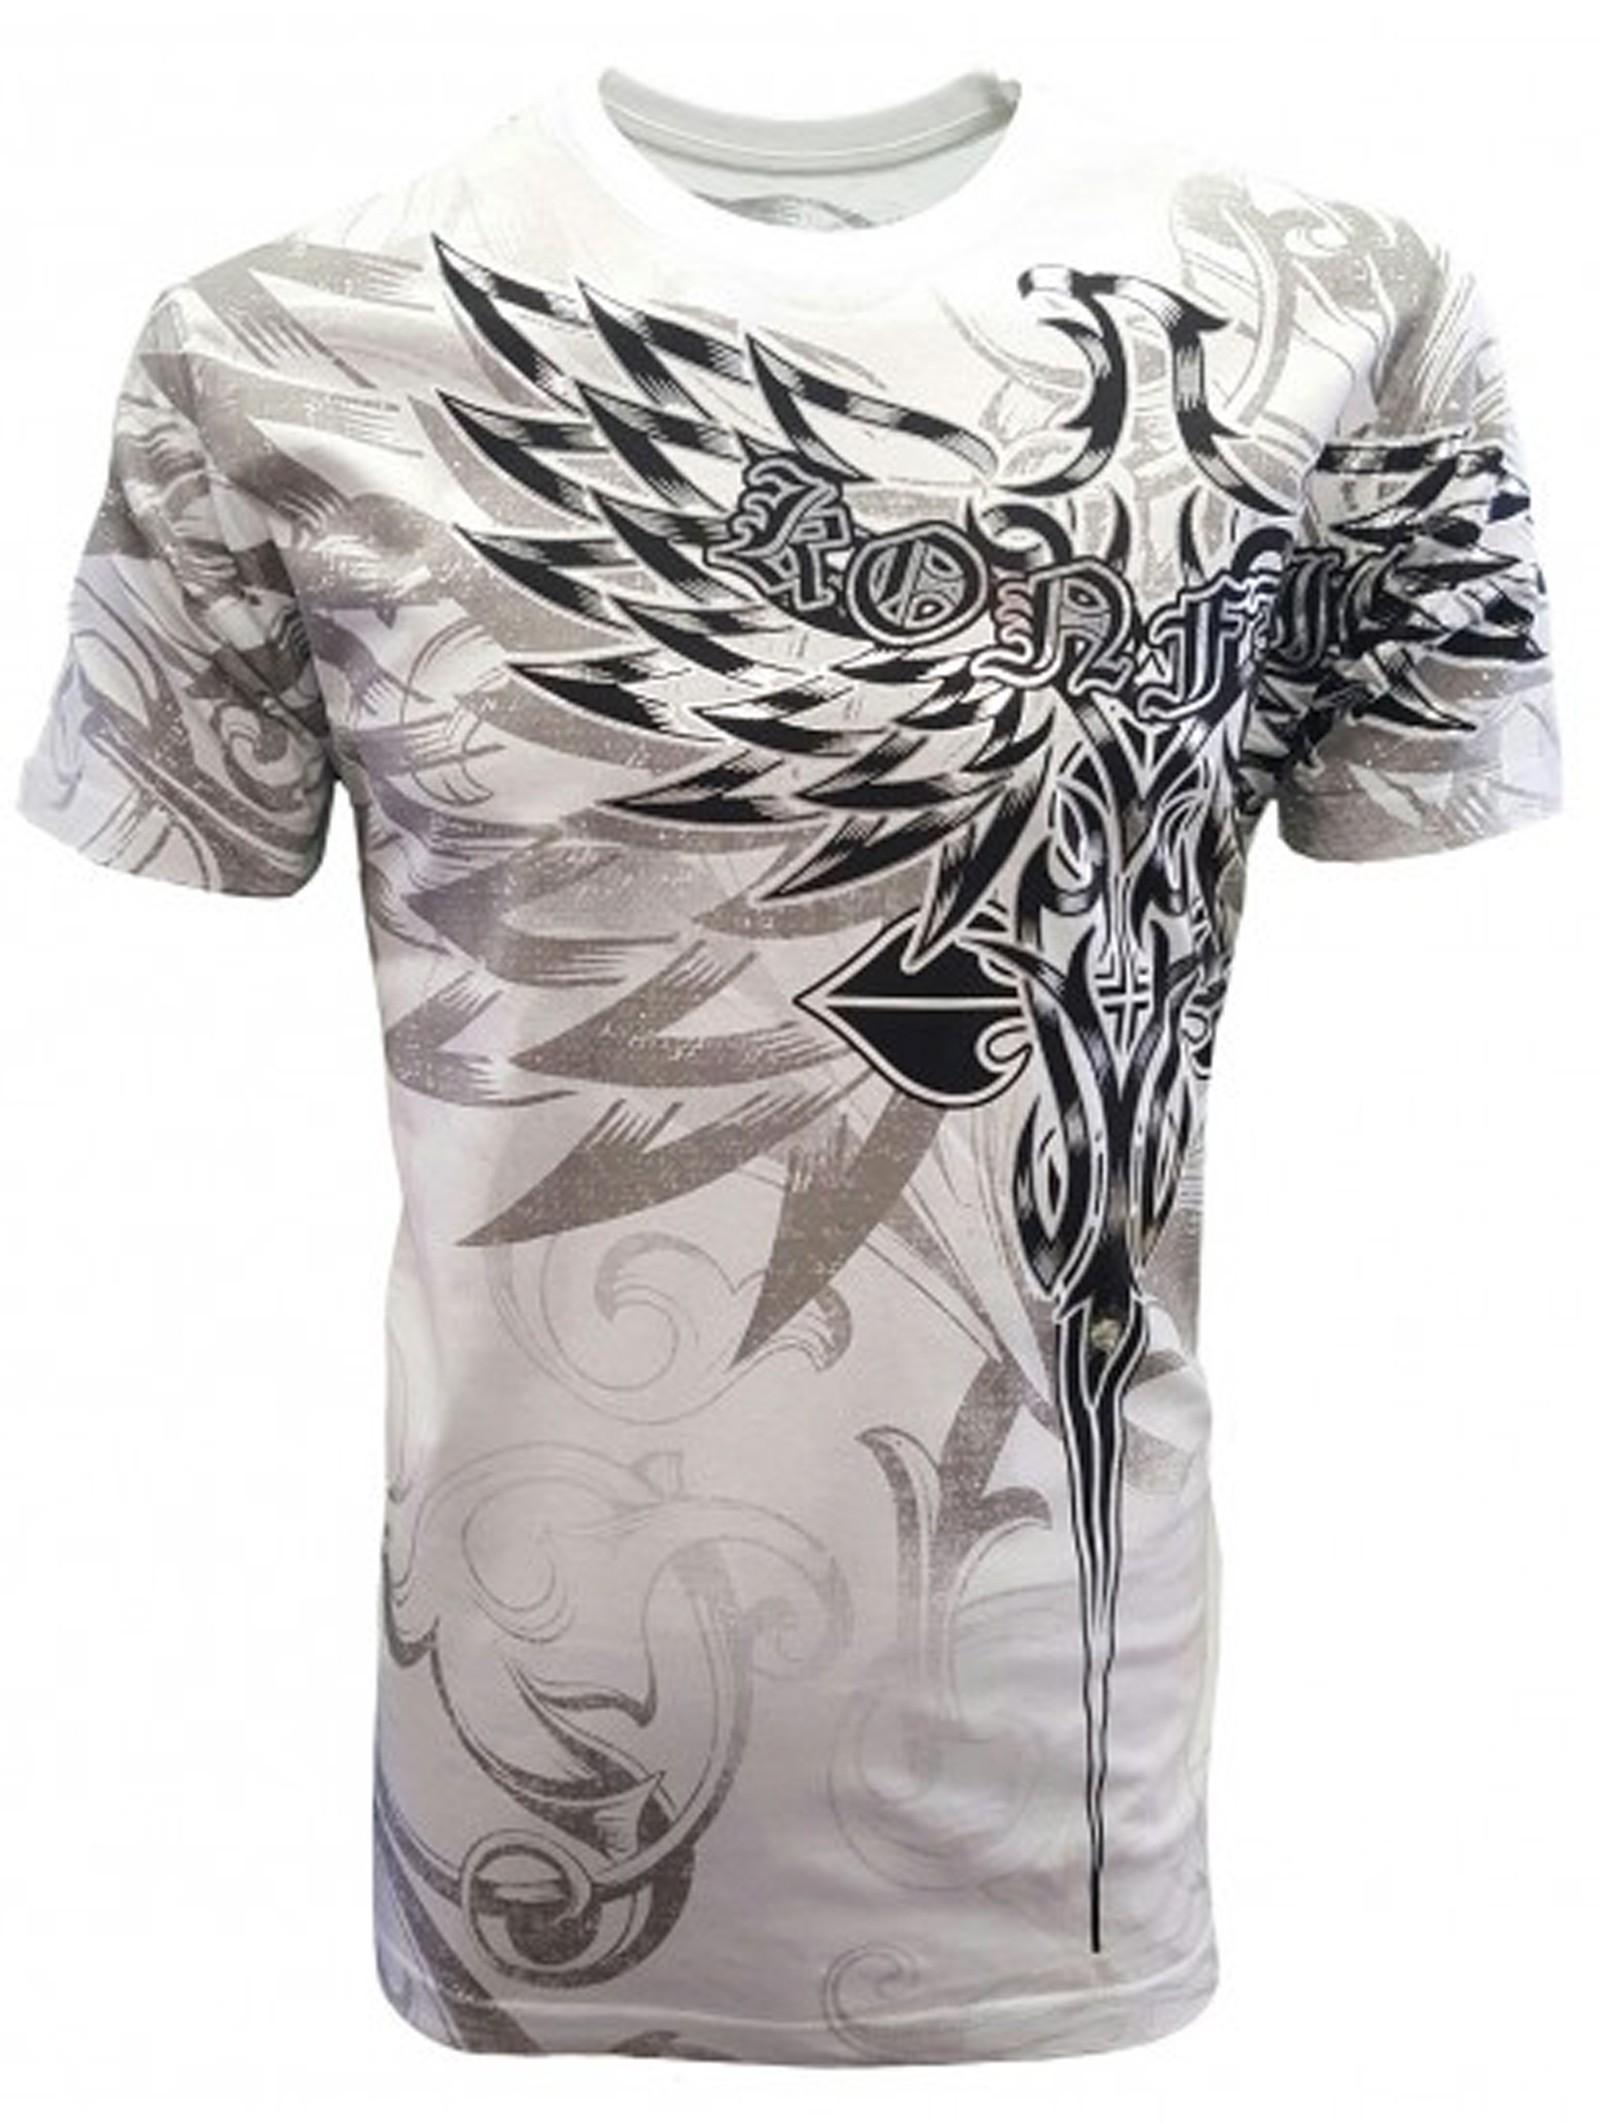 Konflic Clothing - Fenix Rising T-Shirt